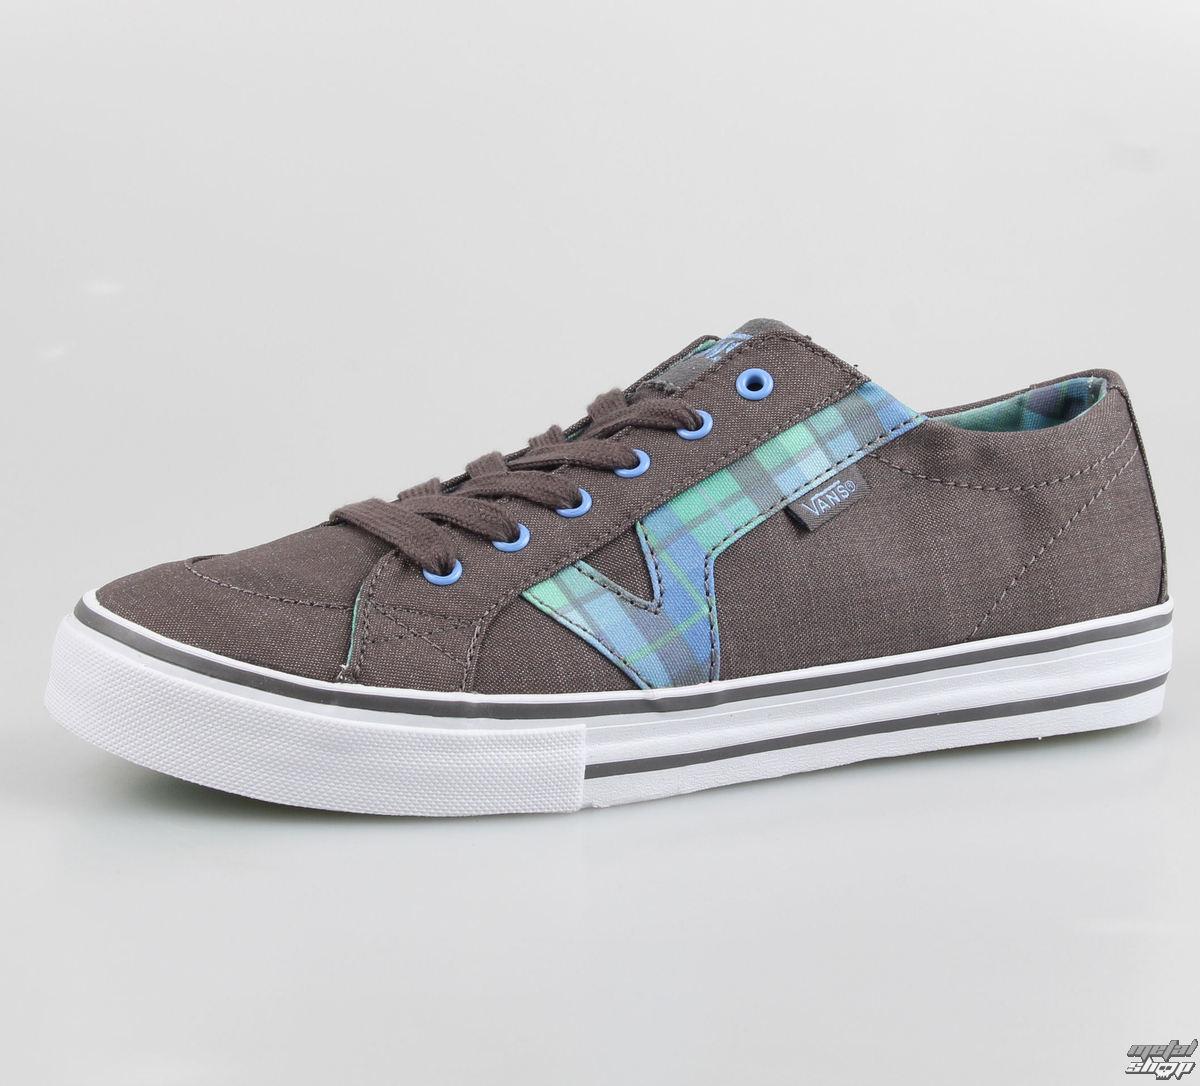 topánky dámske VANS - Tory (Plaid) - Grey/Turquoise - VOK670A